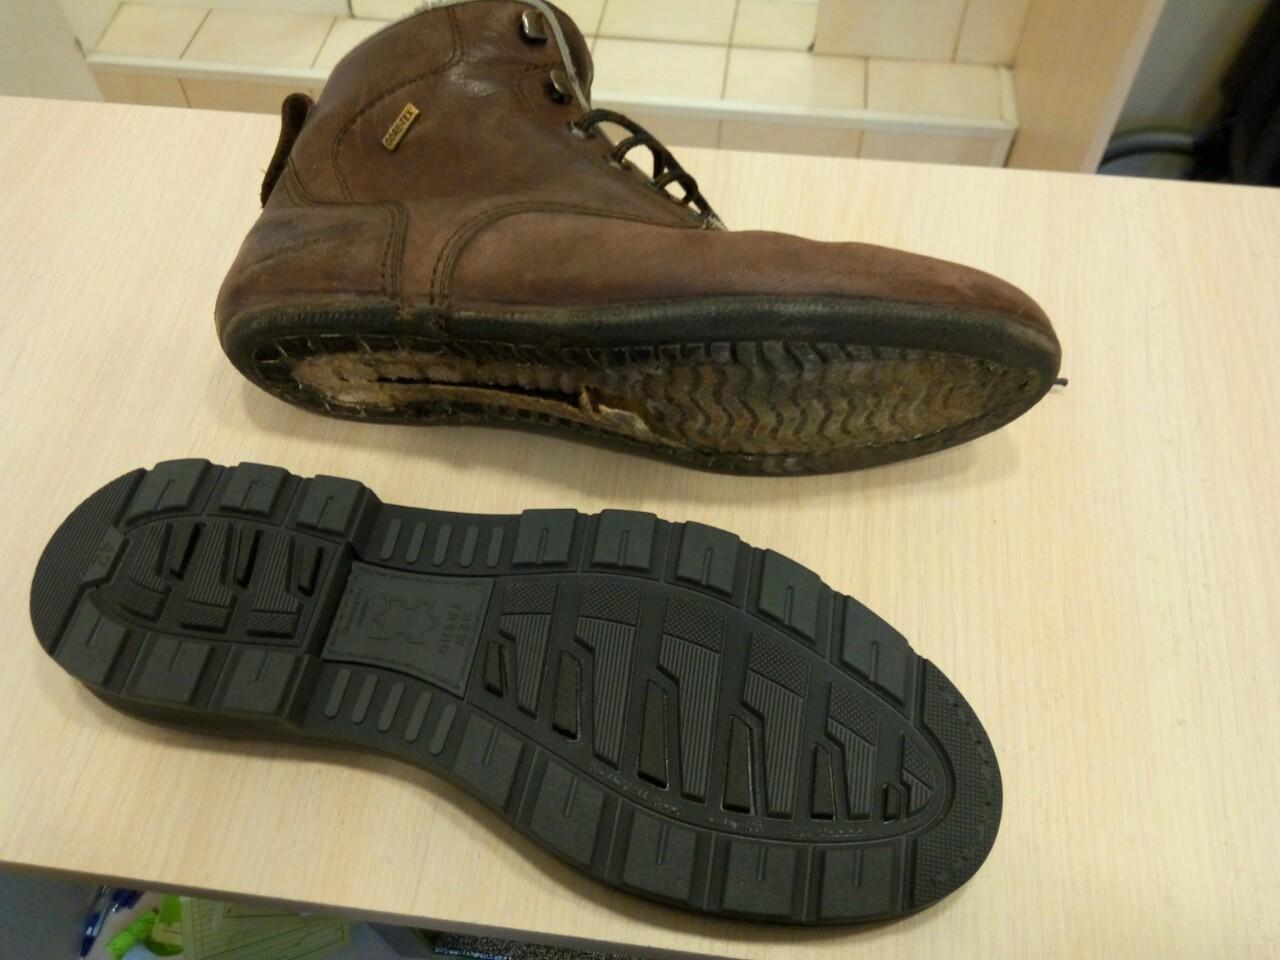 Фото Замена подошвы ботинок.